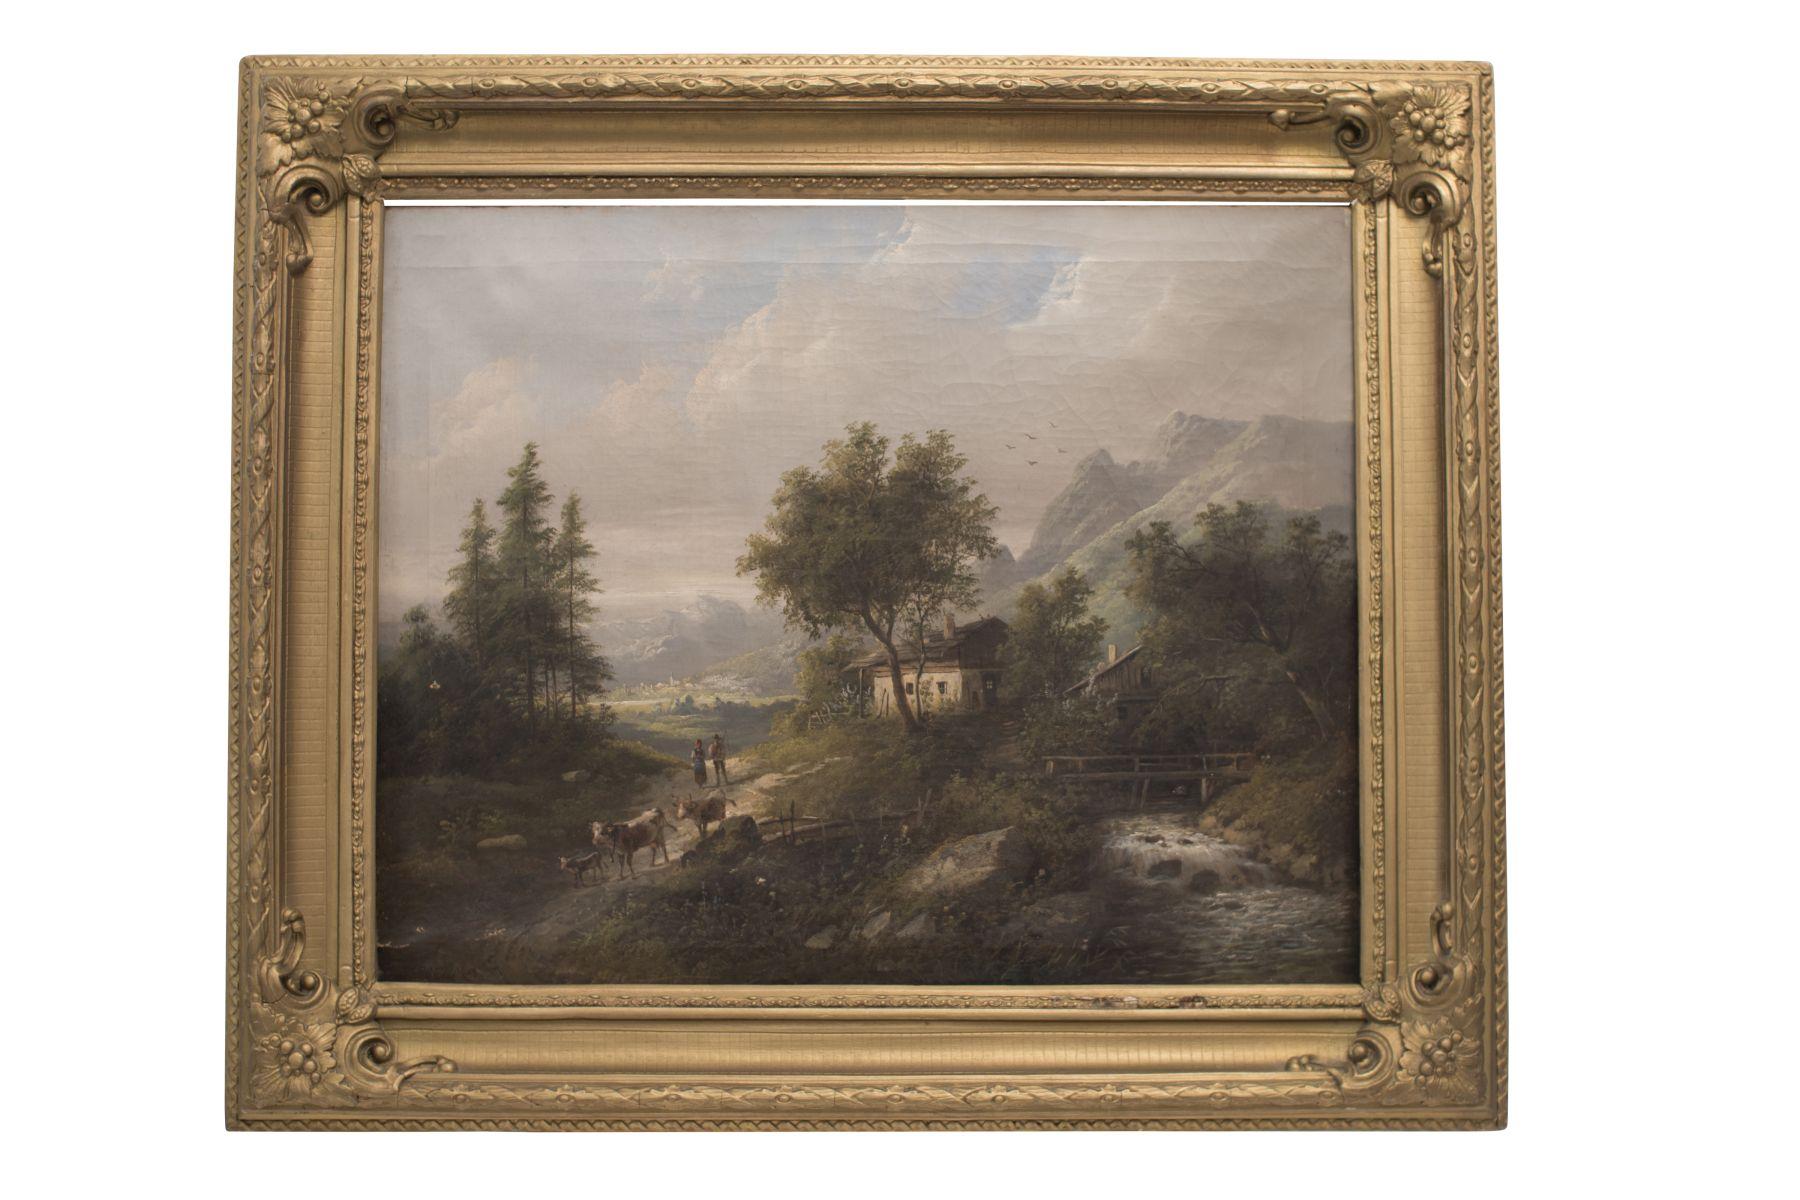 "#90 Farm on the river with cows in Tyrol | Eduard Böhm (1830-1890) ""Bauernhof am Fluss mit Kühen in Tirol"" Image"